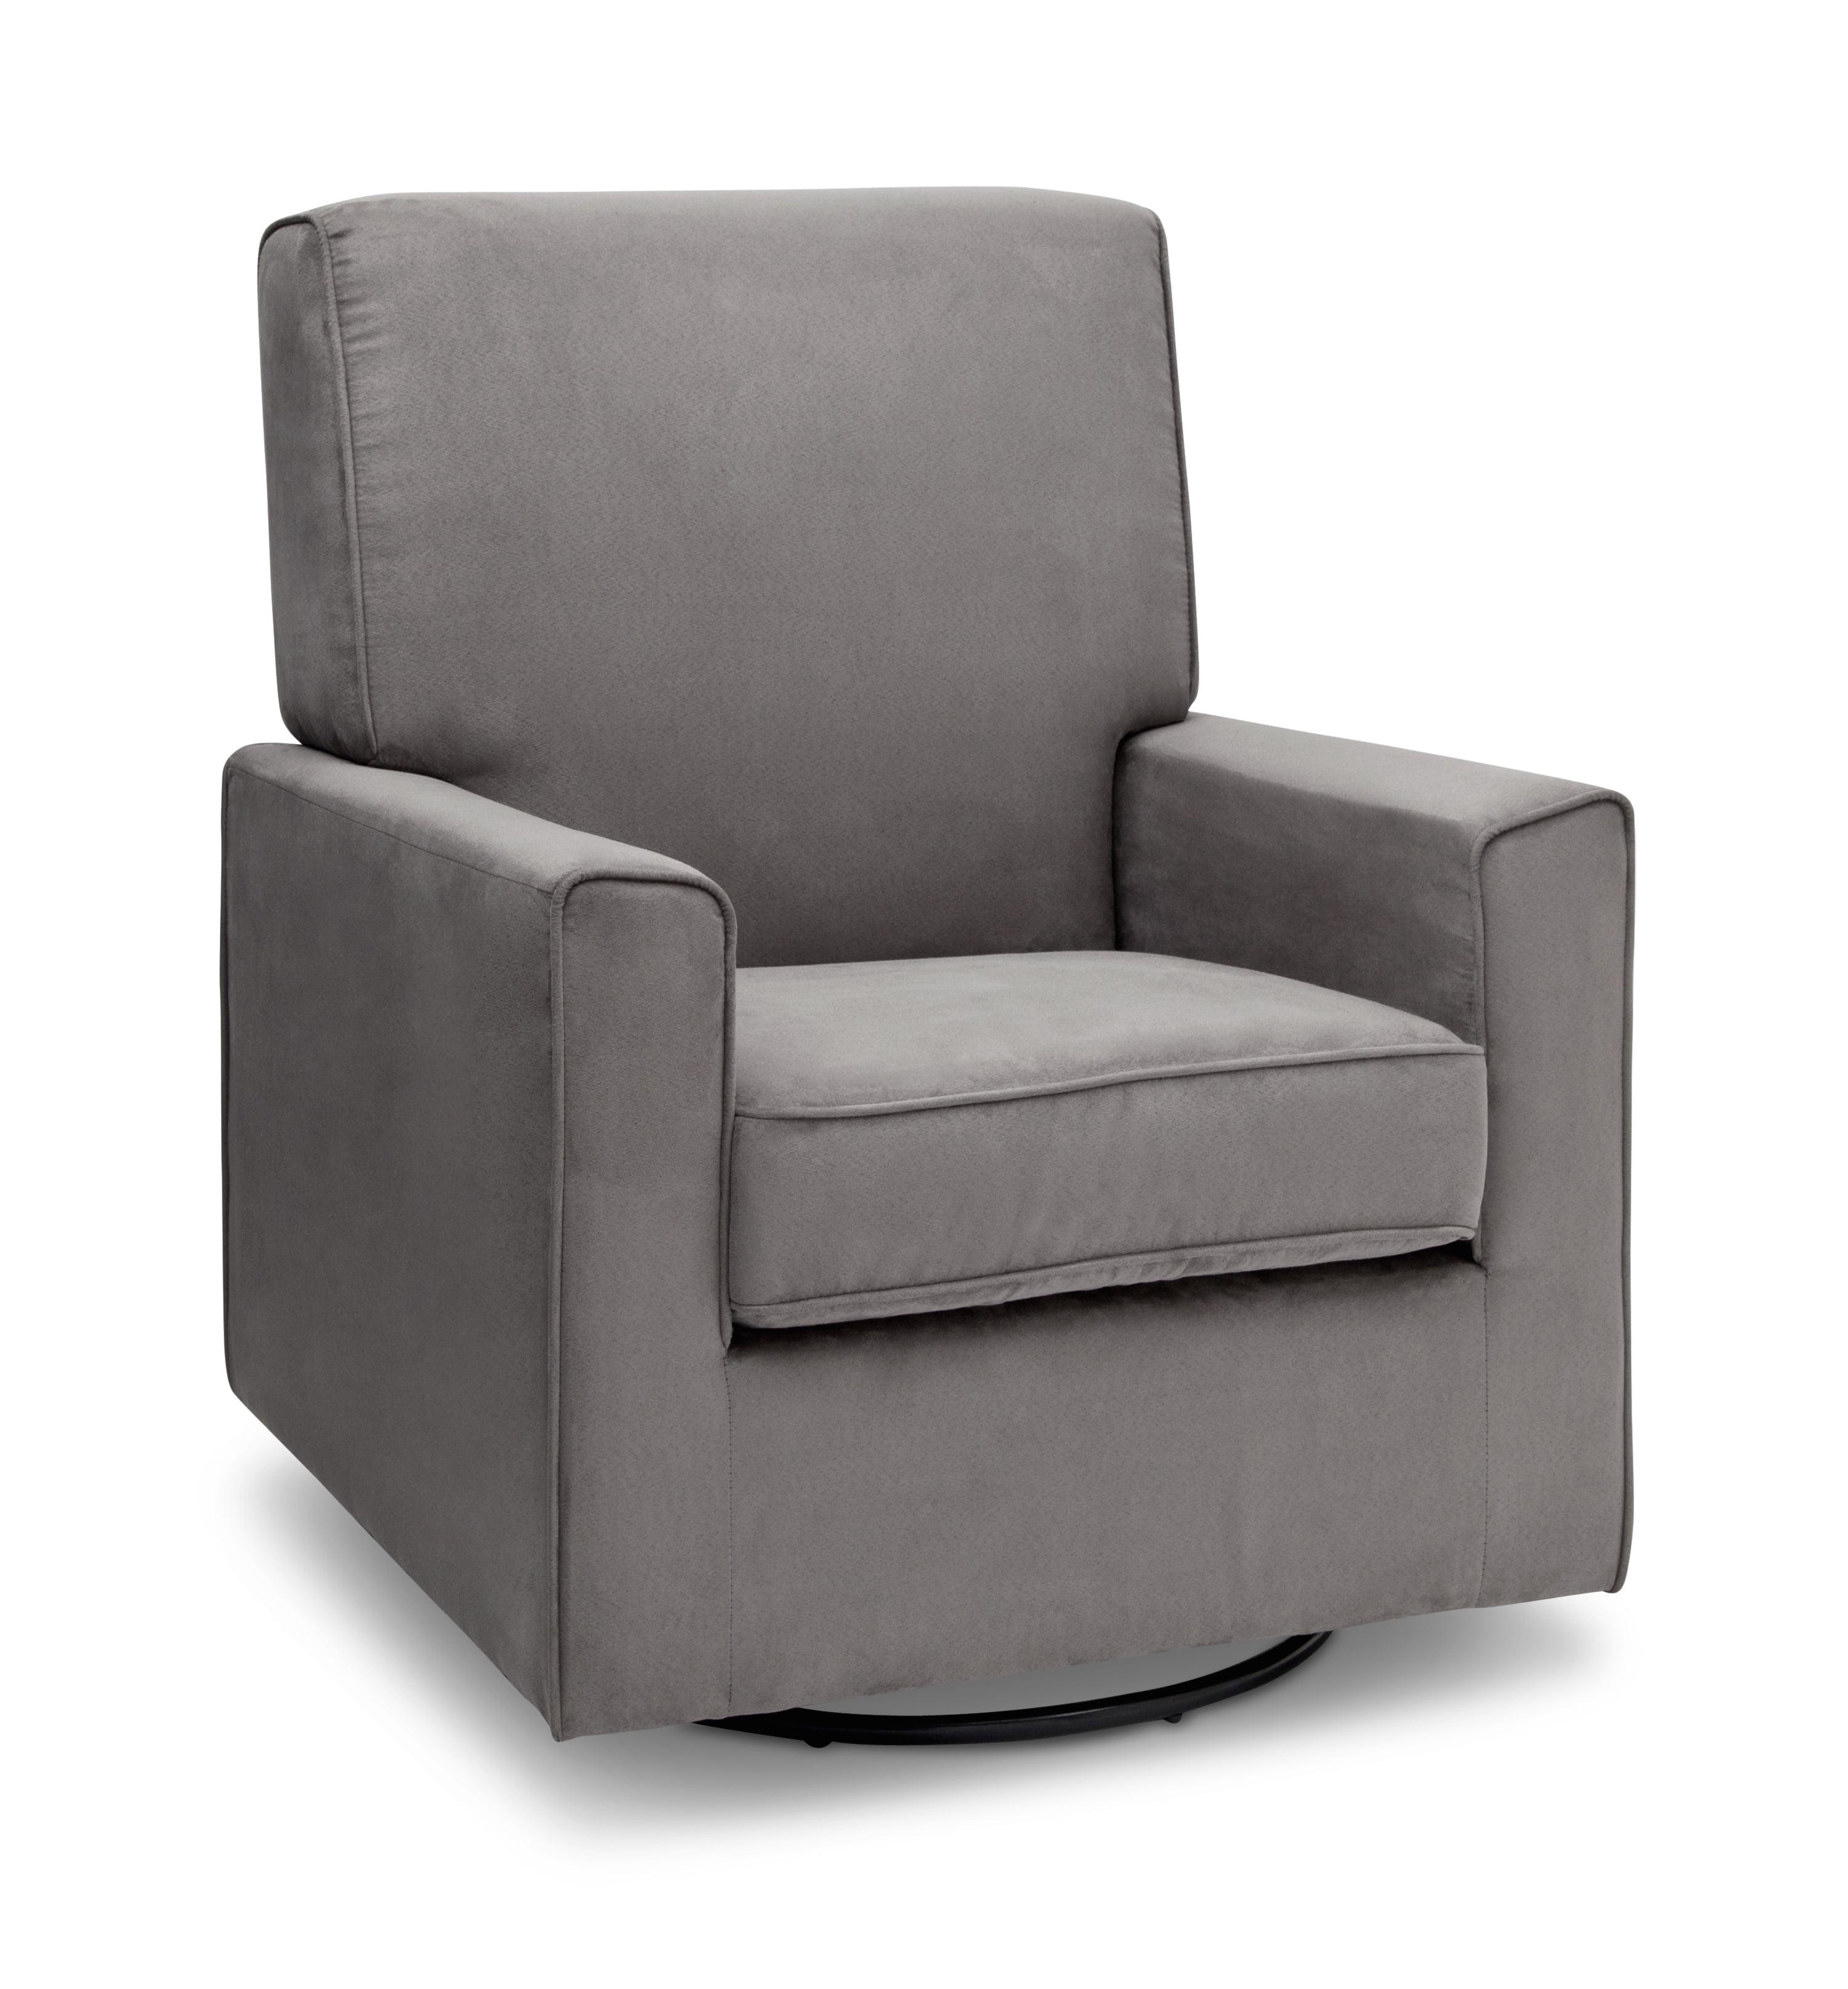 Delta Children Ava Nursery Glider Swivel Rocker Chair Choose Your Color